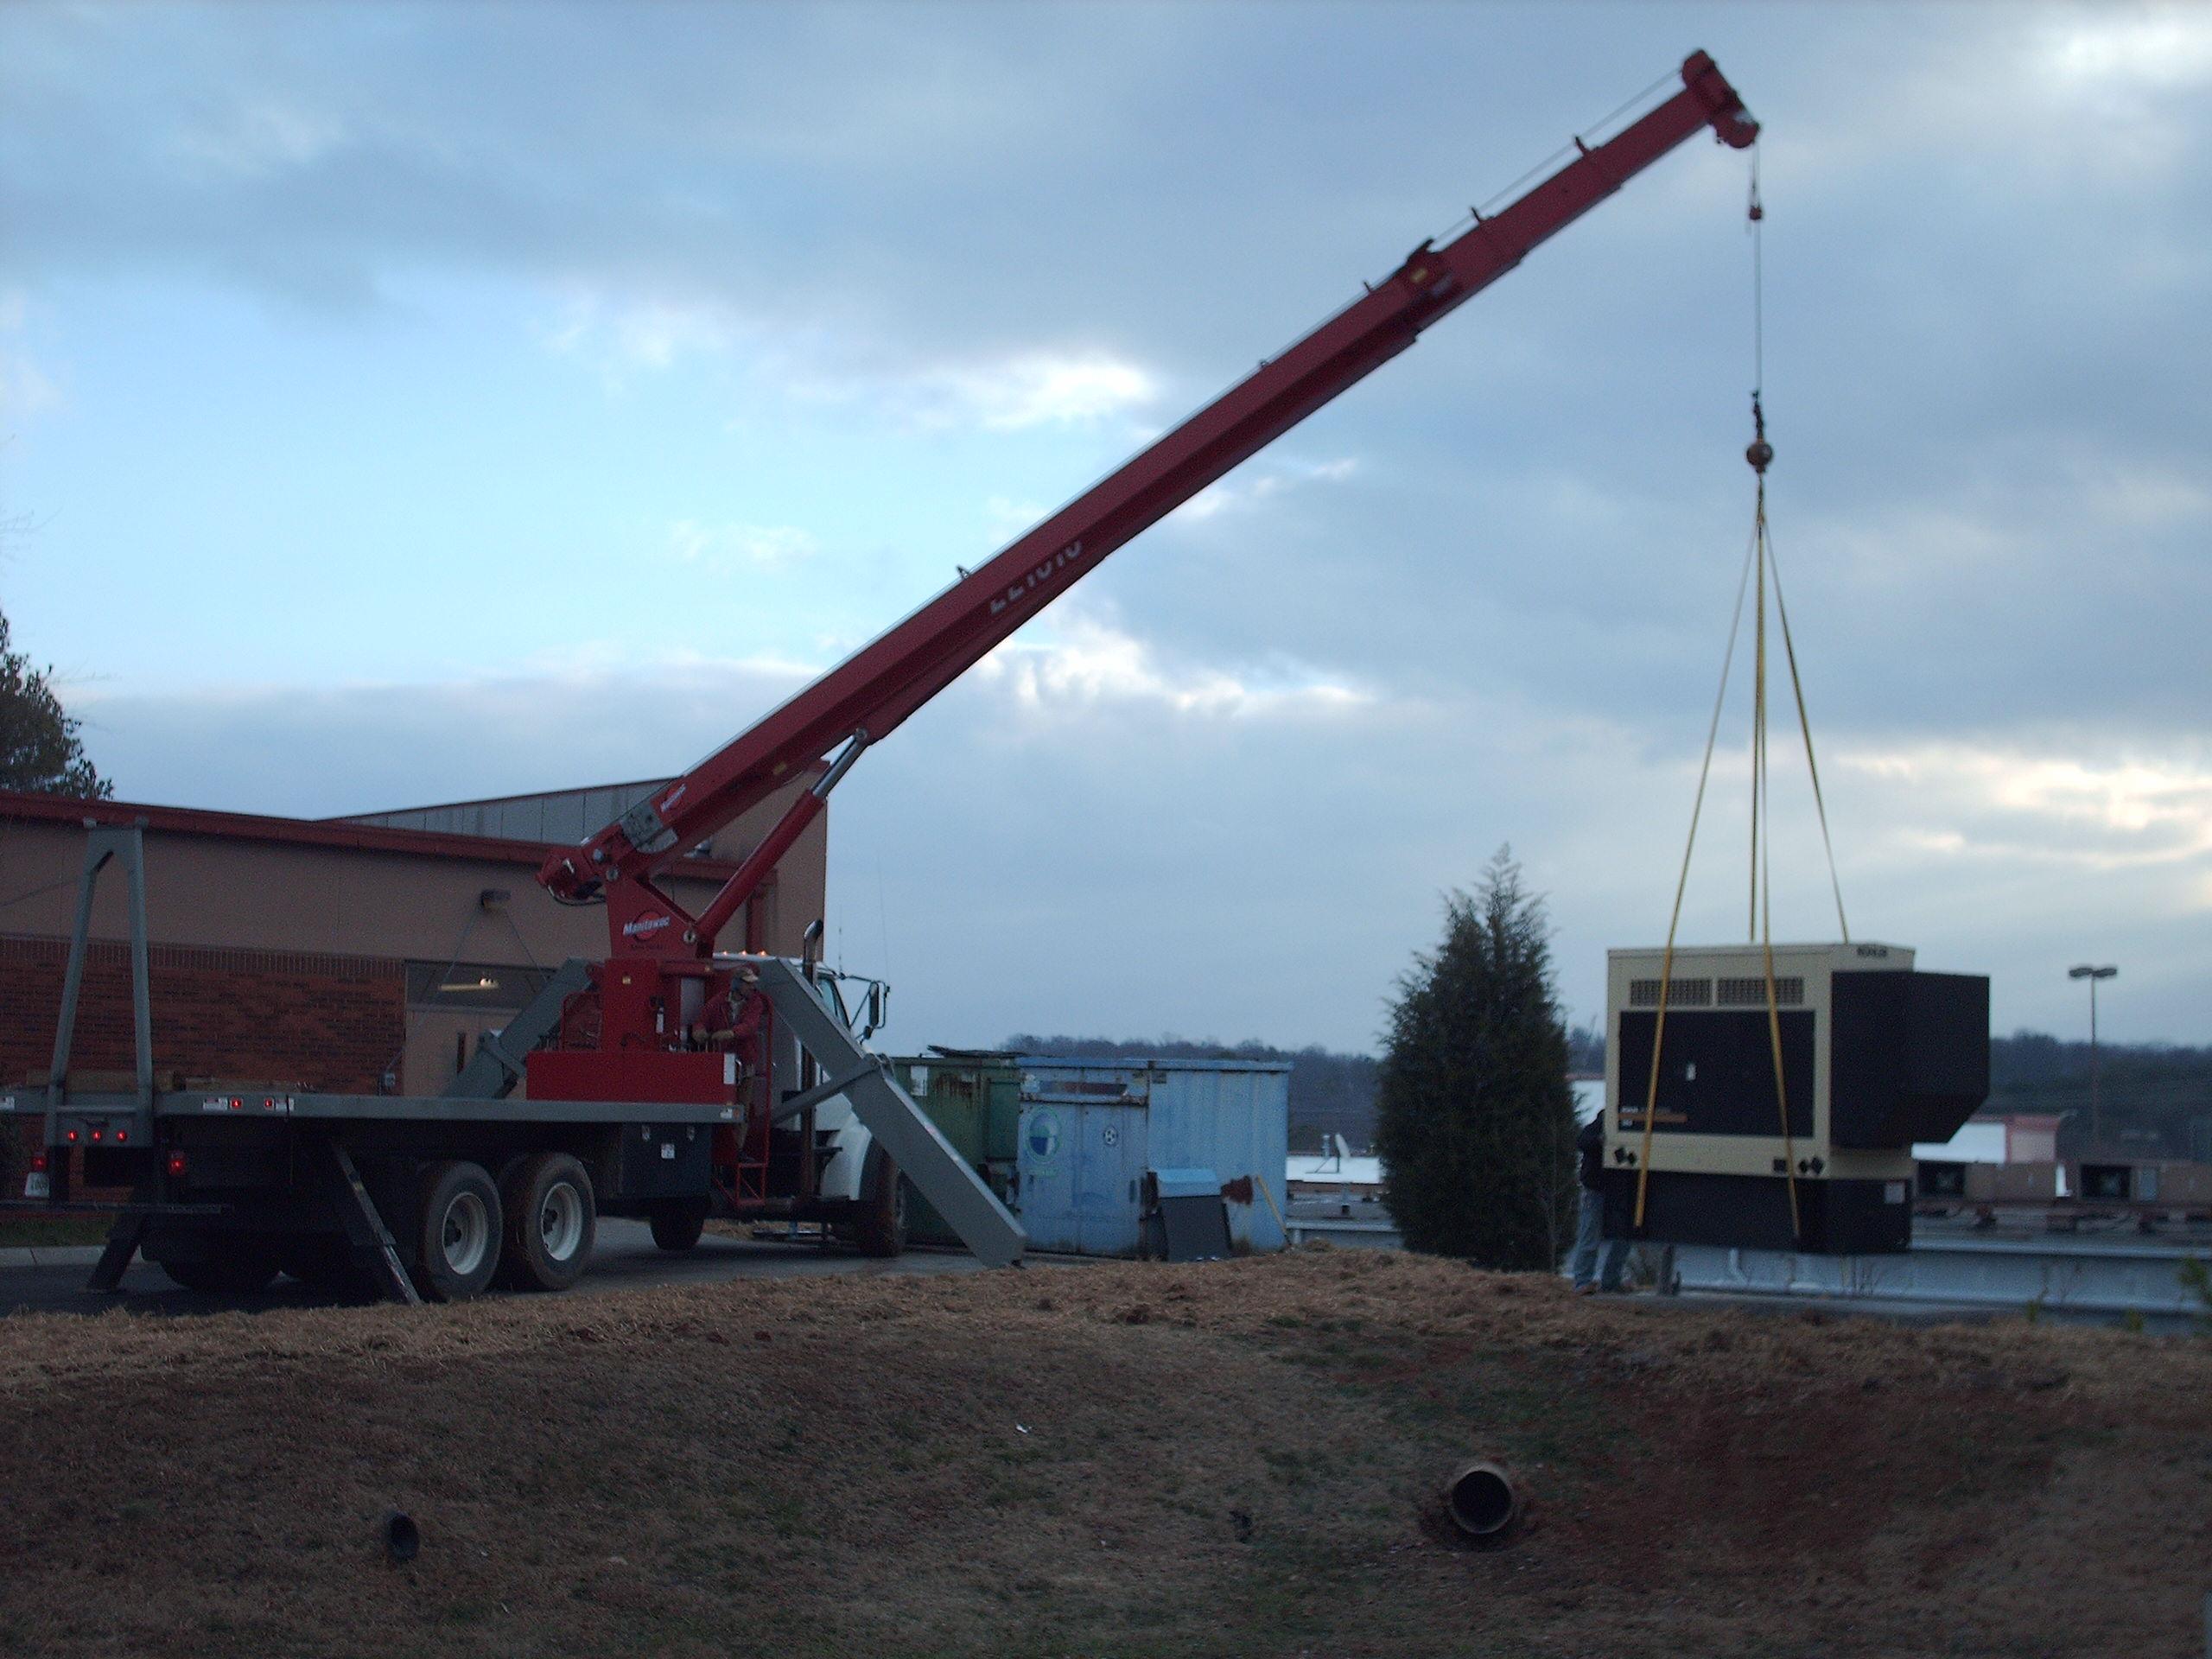 generatorlift.jpg